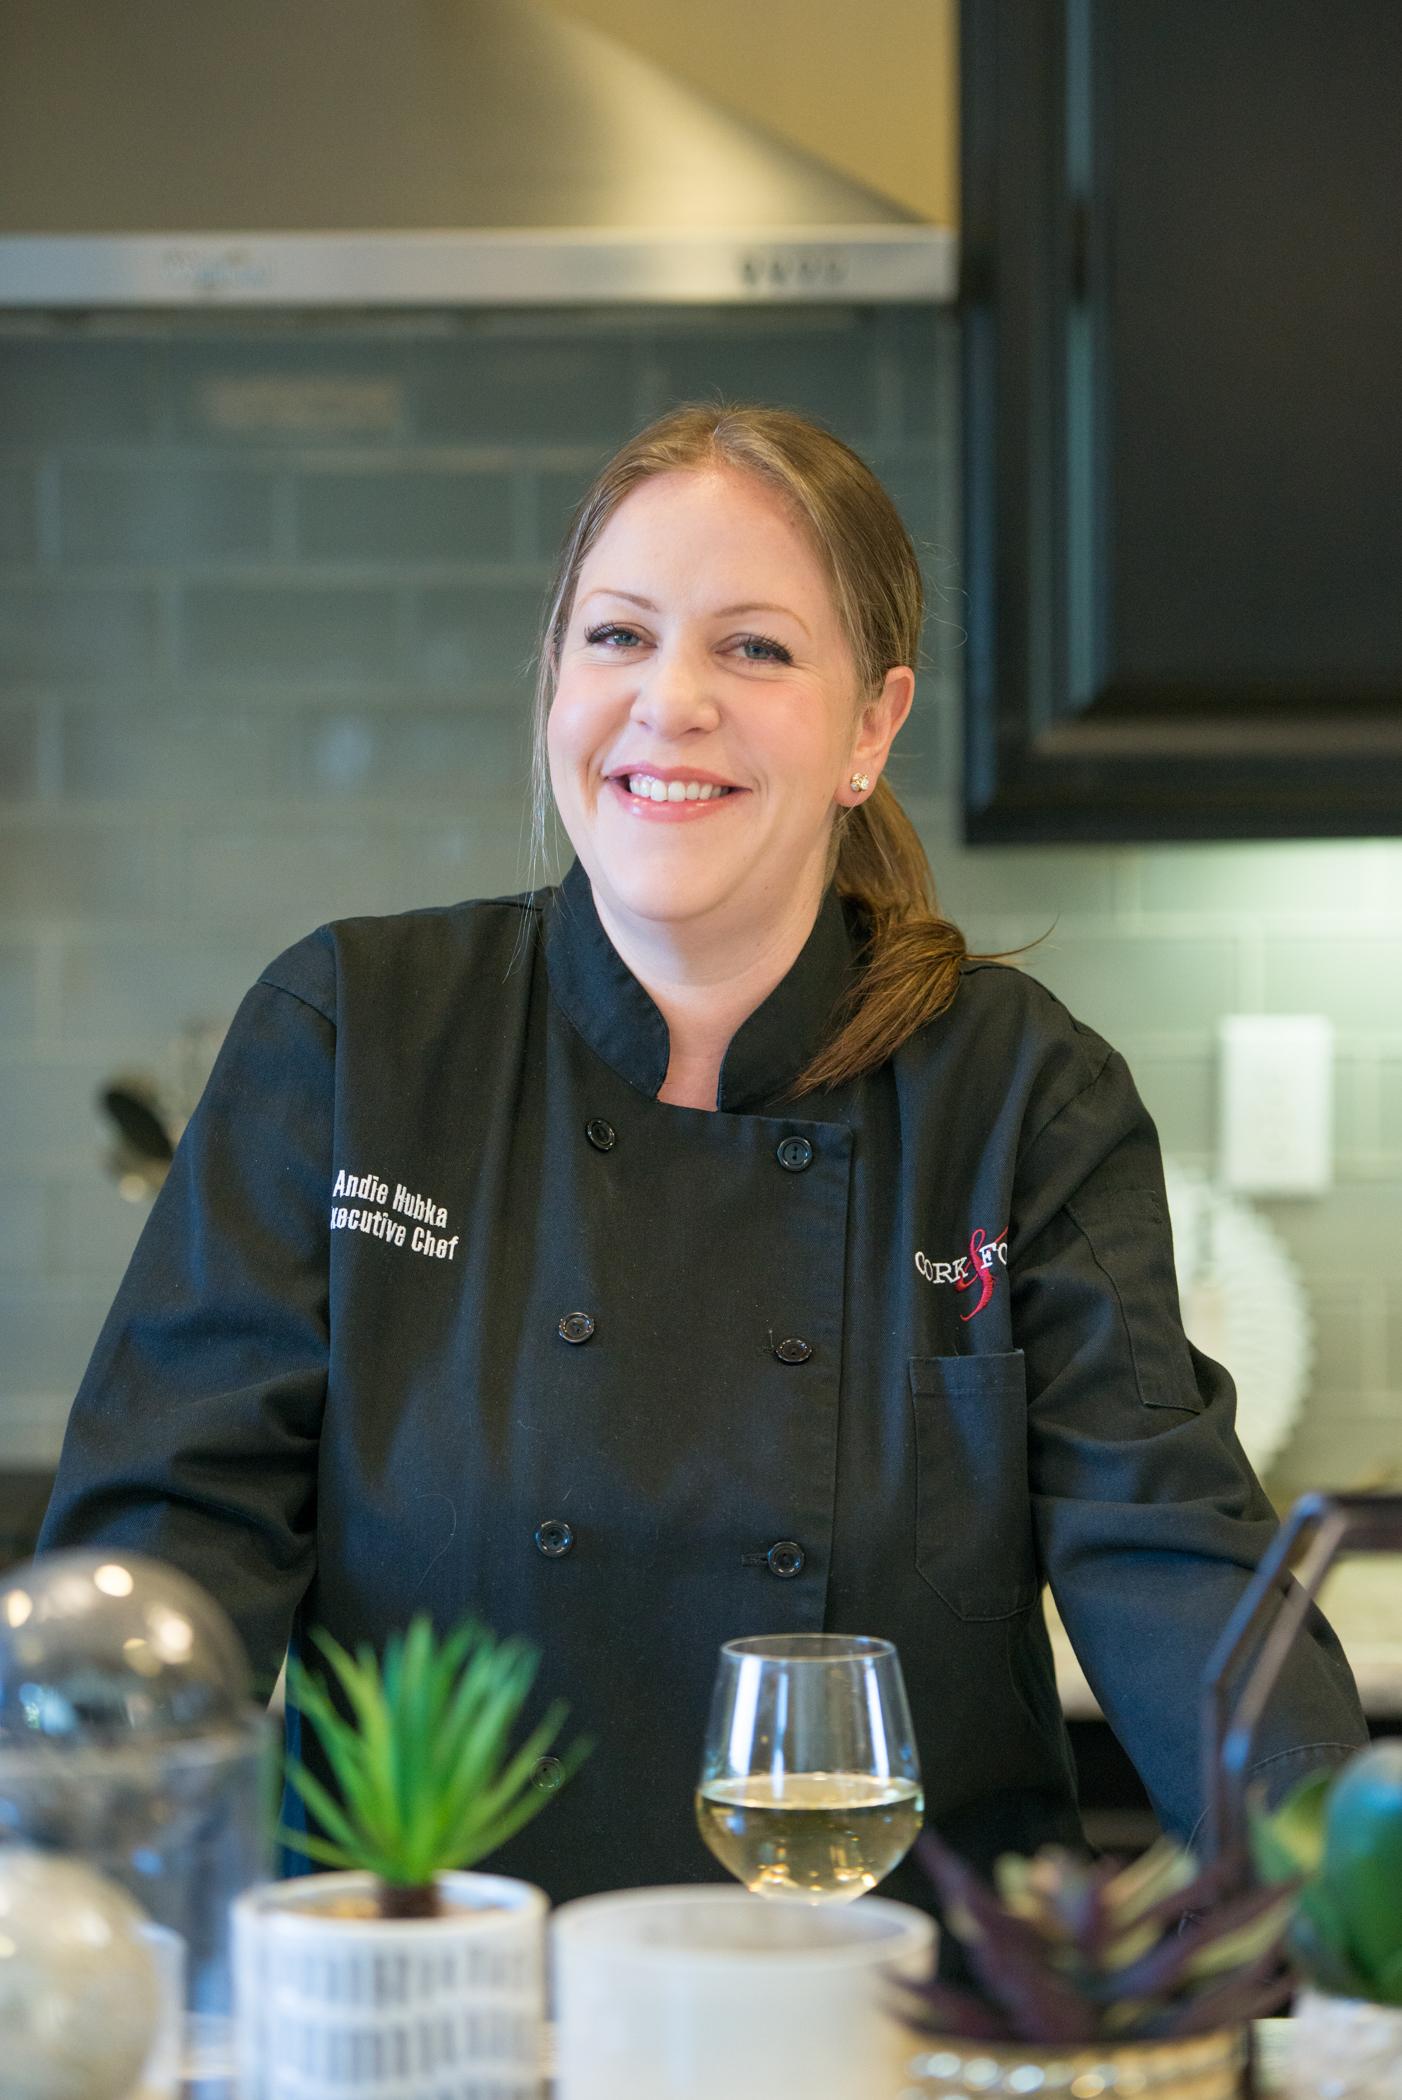 Executive Chef Andie HUbka 2020 sm-29